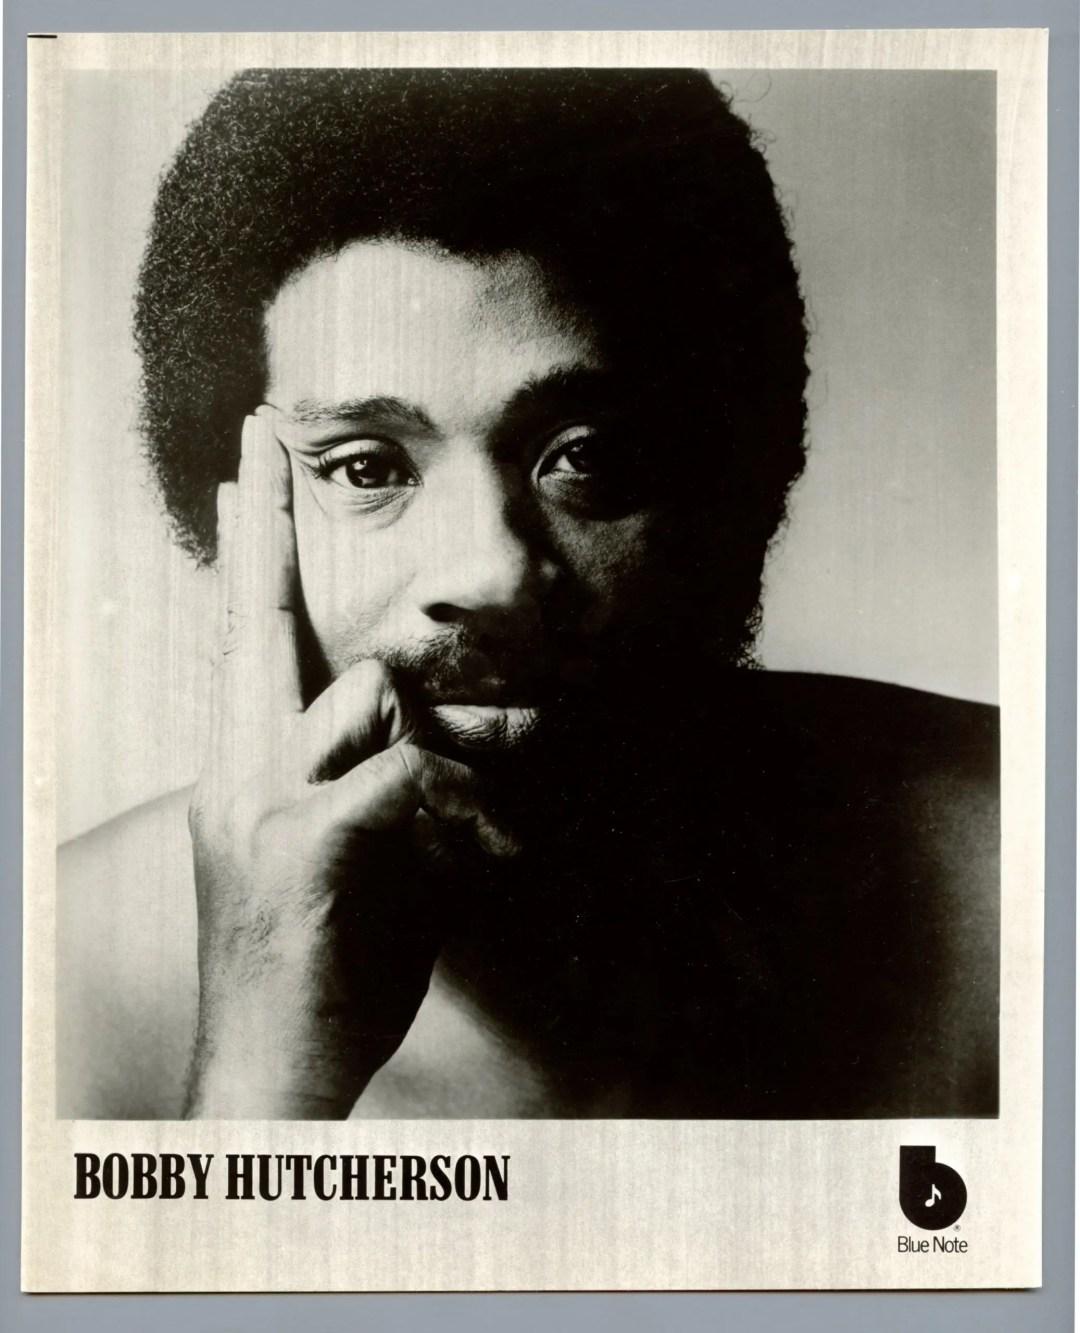 Bobby Hutcherson Photo Publicity Promo Blue Note 1975